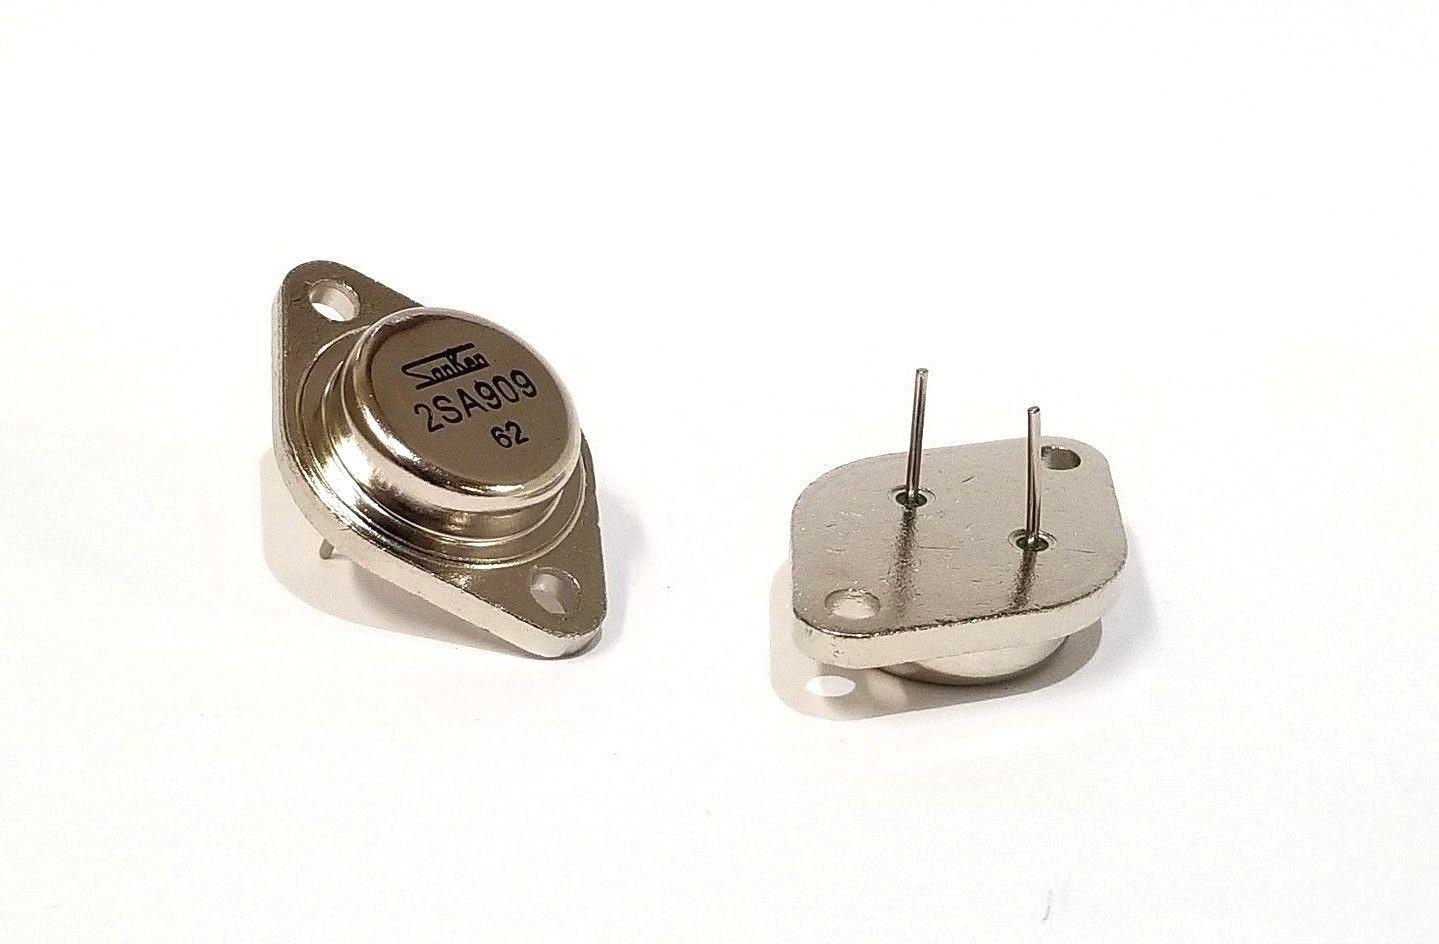 INFRA IS81K INDUCTIVE PROXIMITY SENSOR 5MM RANGE 24-230VAC NEW CONDITION